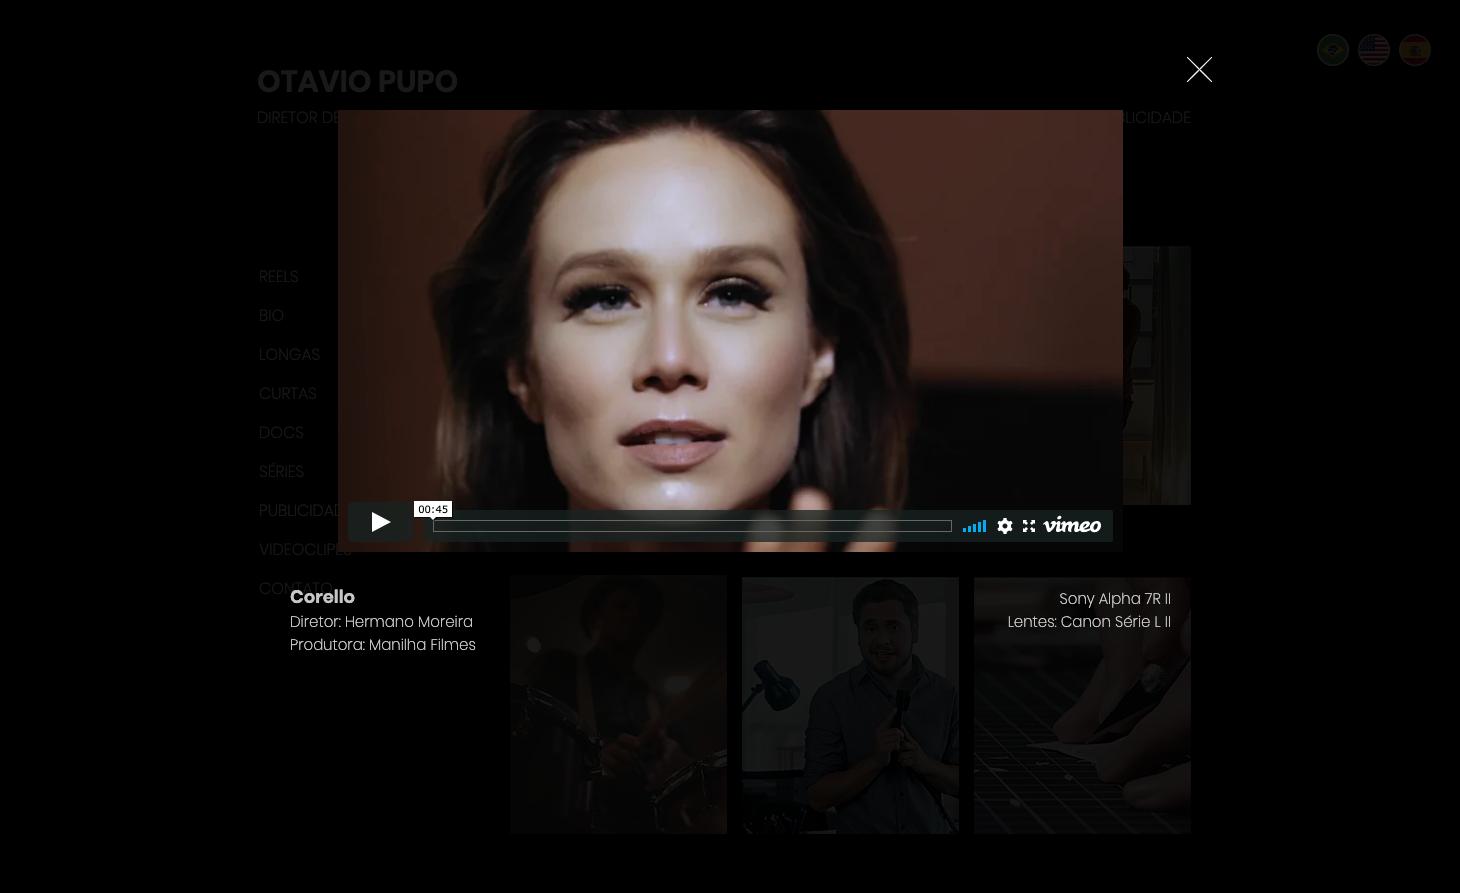 Tavinho-desktop3.png